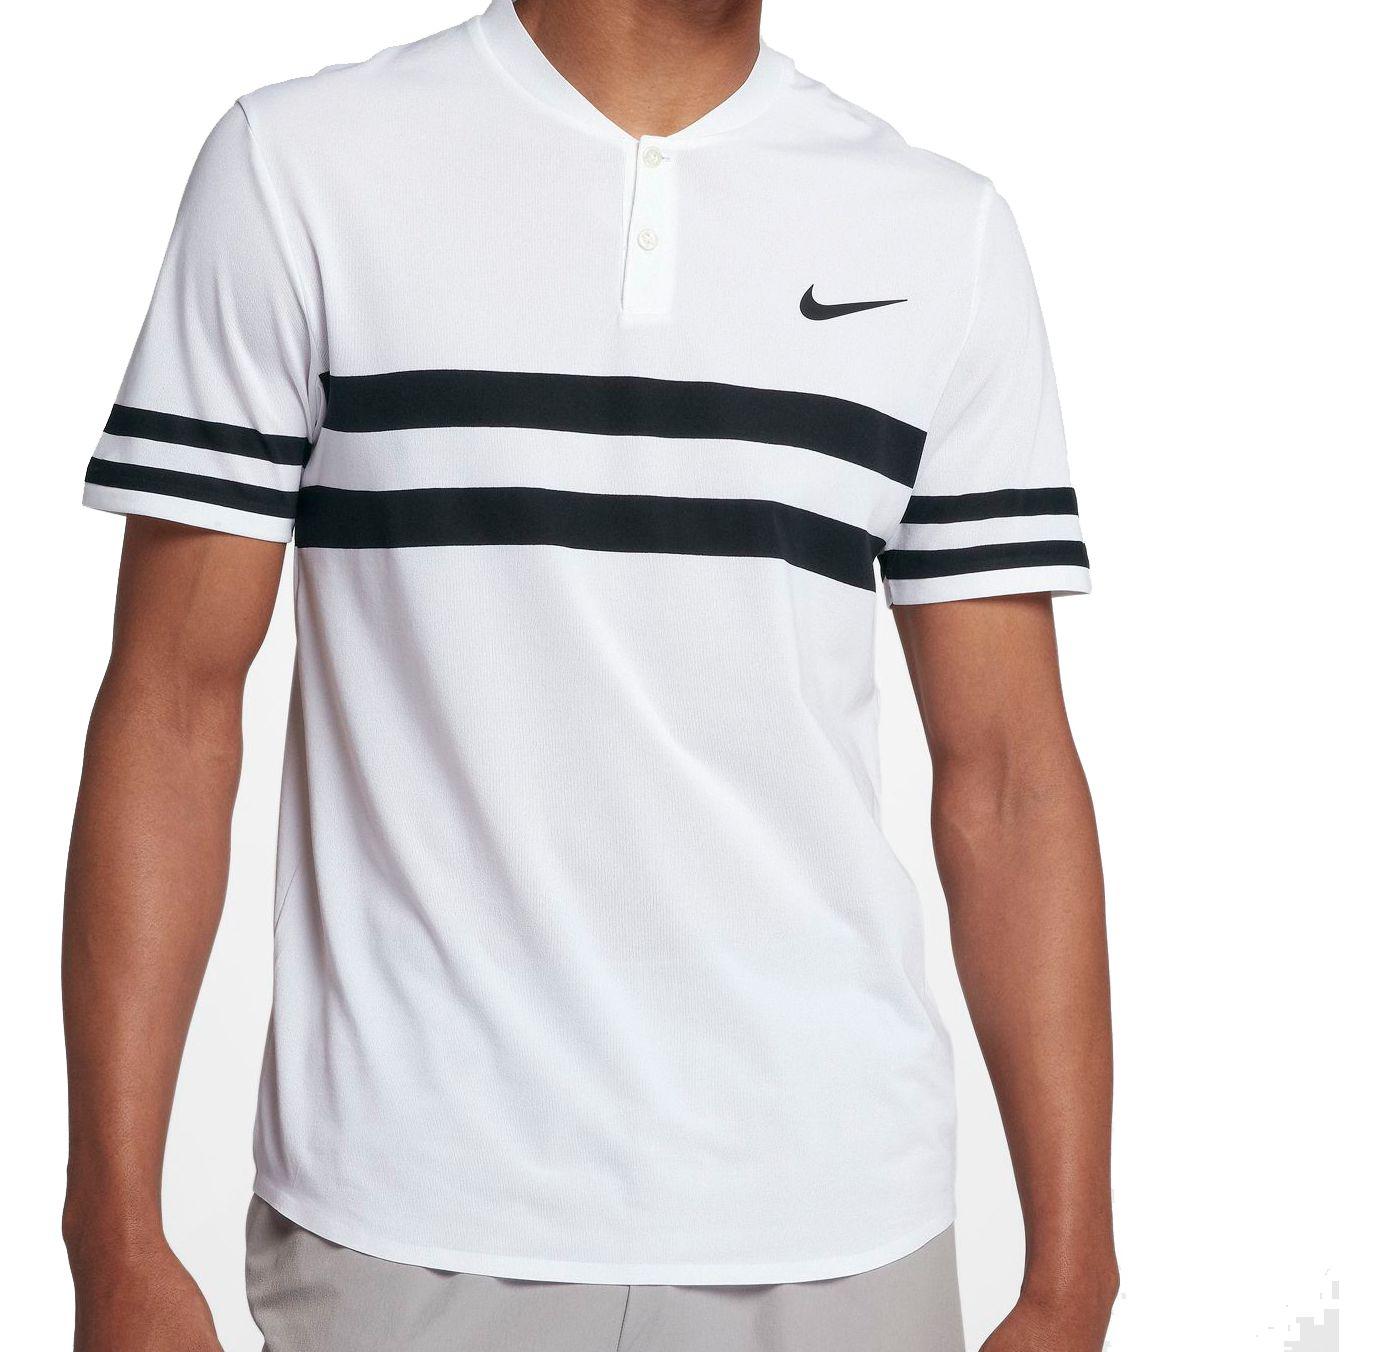 Nike Men's Court Advantage Stripe Tennis Polo